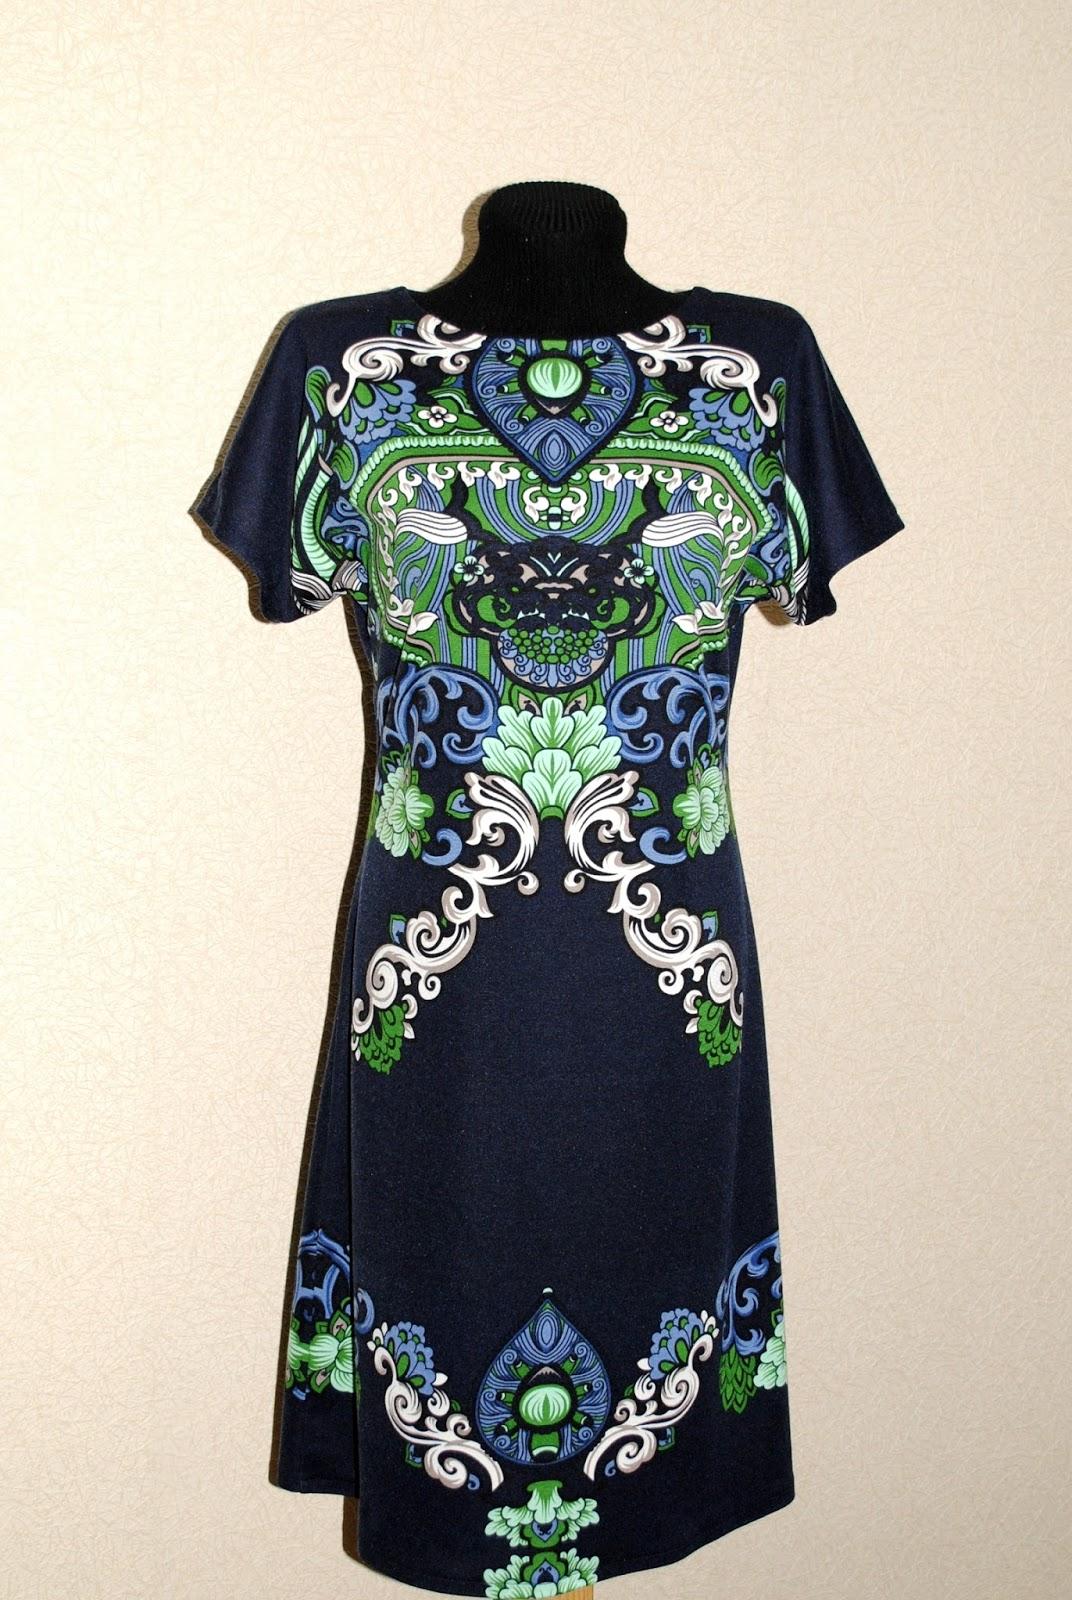 Фото платье из трикотажа своими руками фото 108